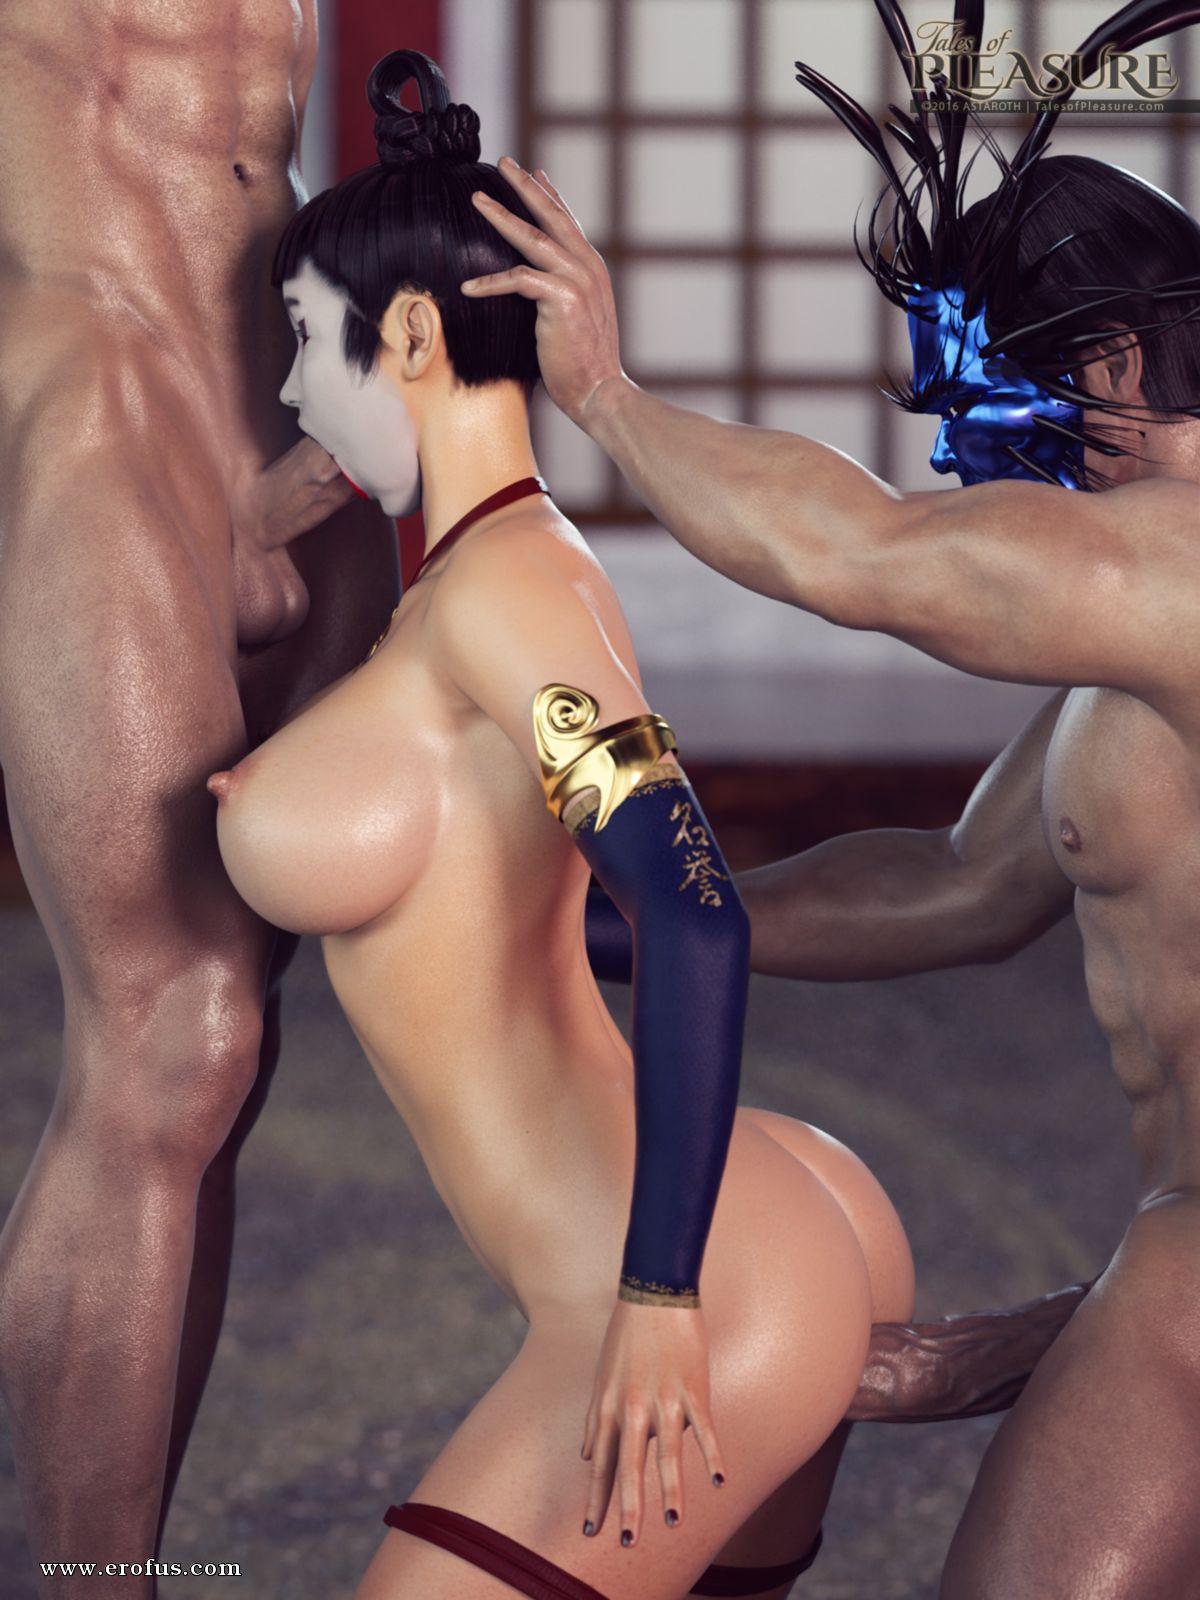 spuiten boobs